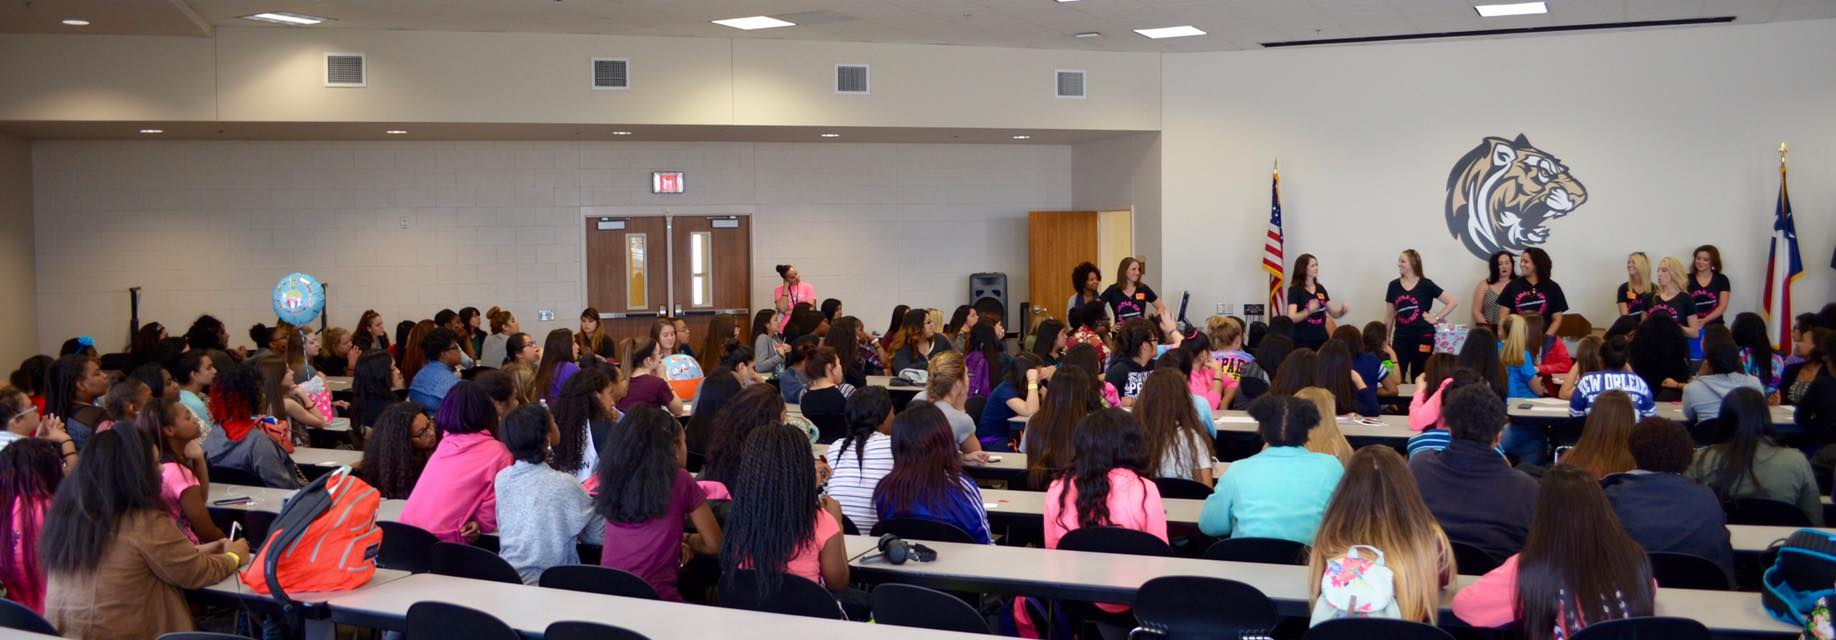 Conroe highschool sisterhood squad meeting